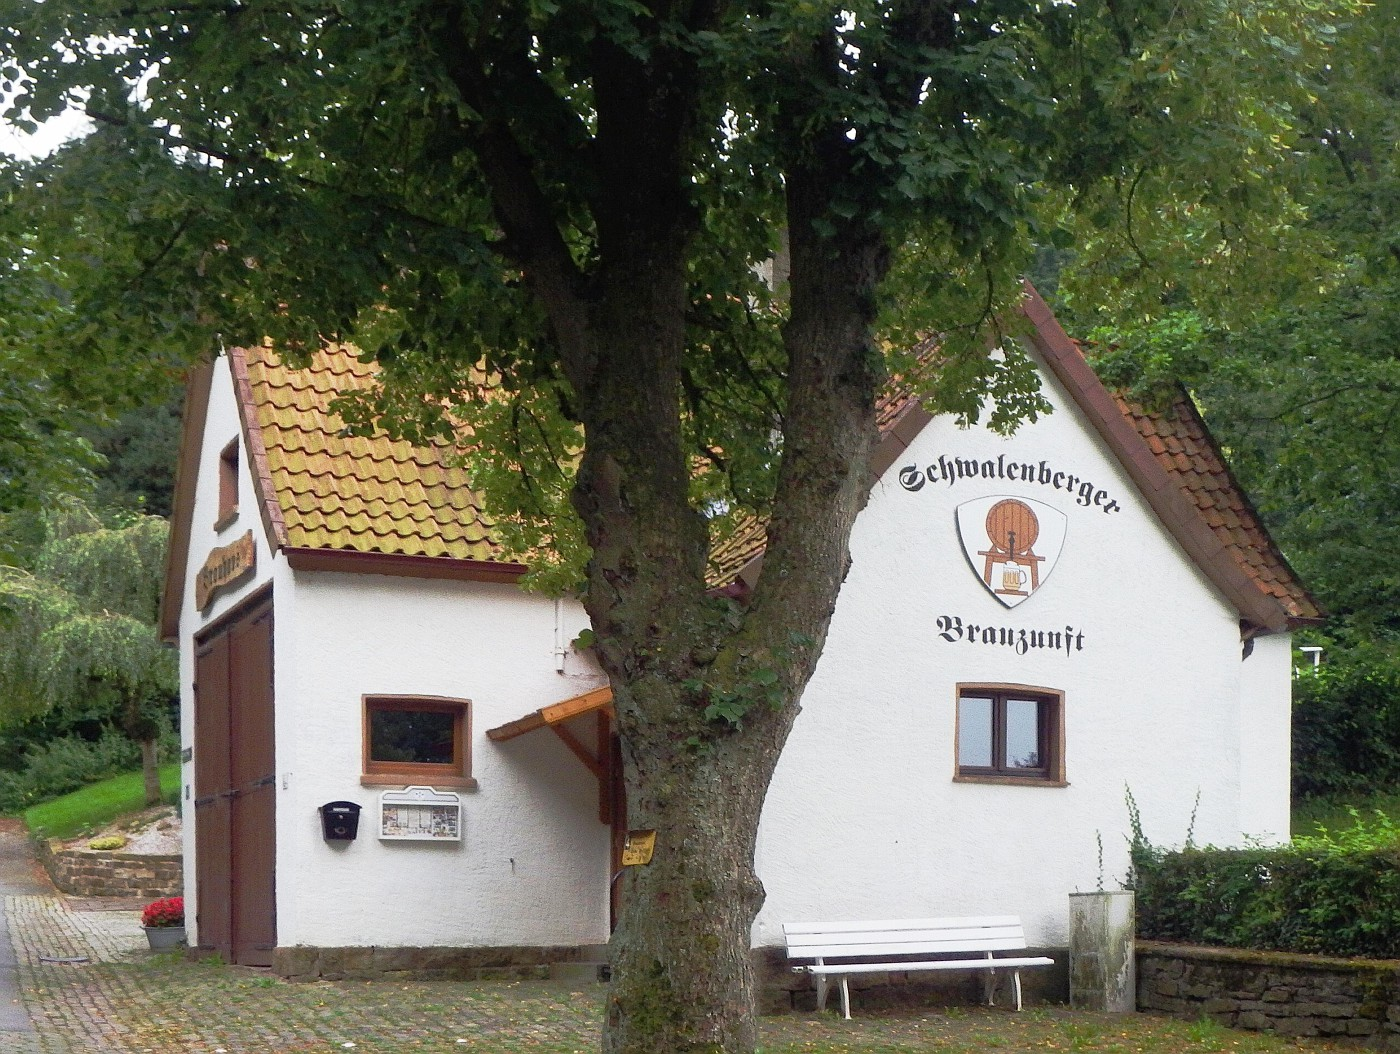 Brauhaus Schwalenberg